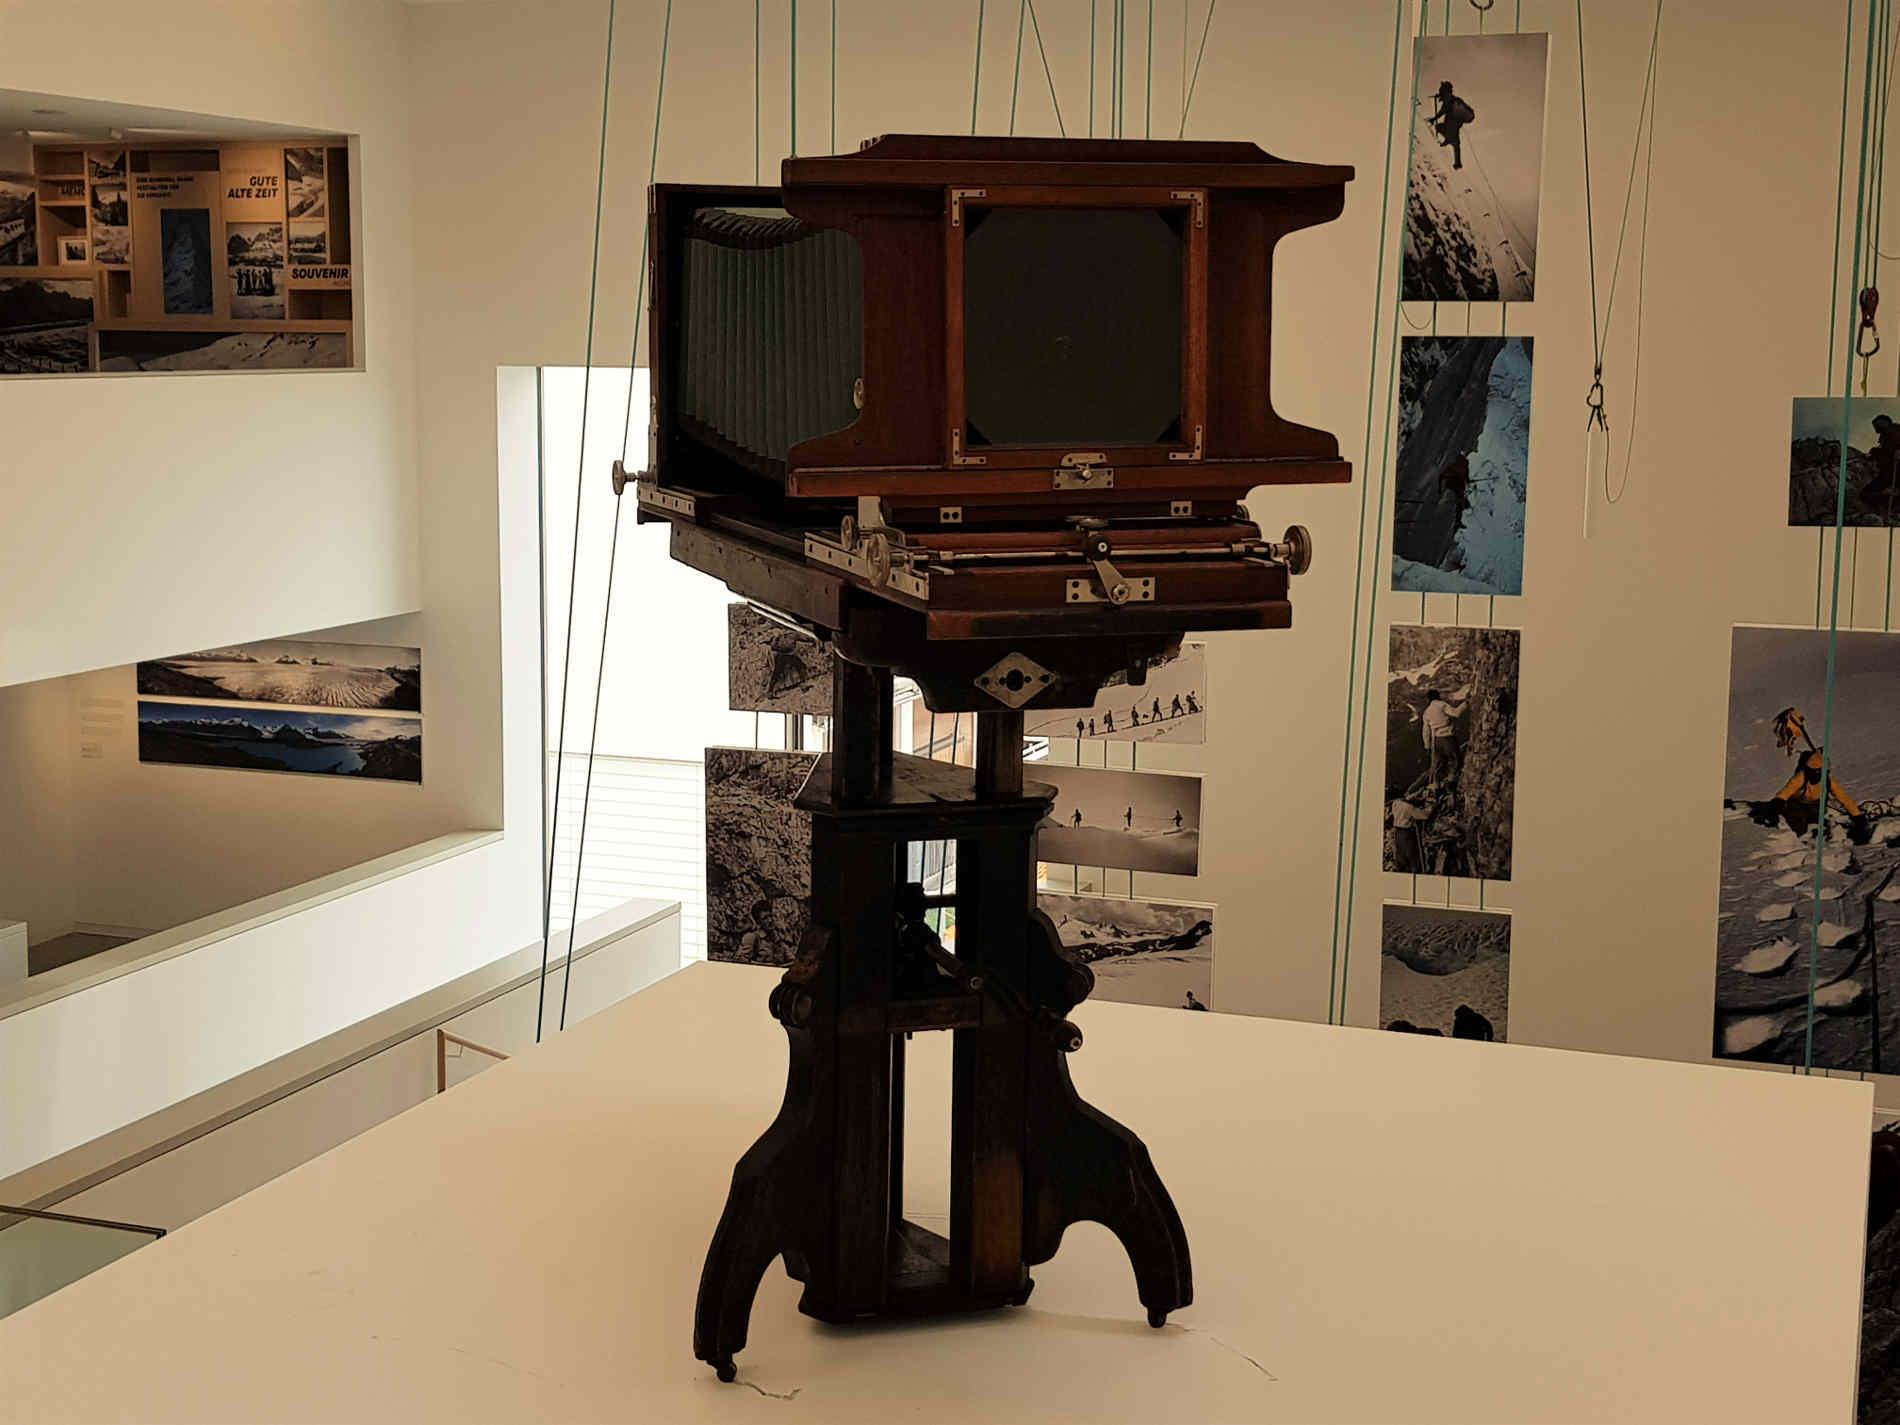 macchina fotografica al Lumen Museum a Plan de Corones